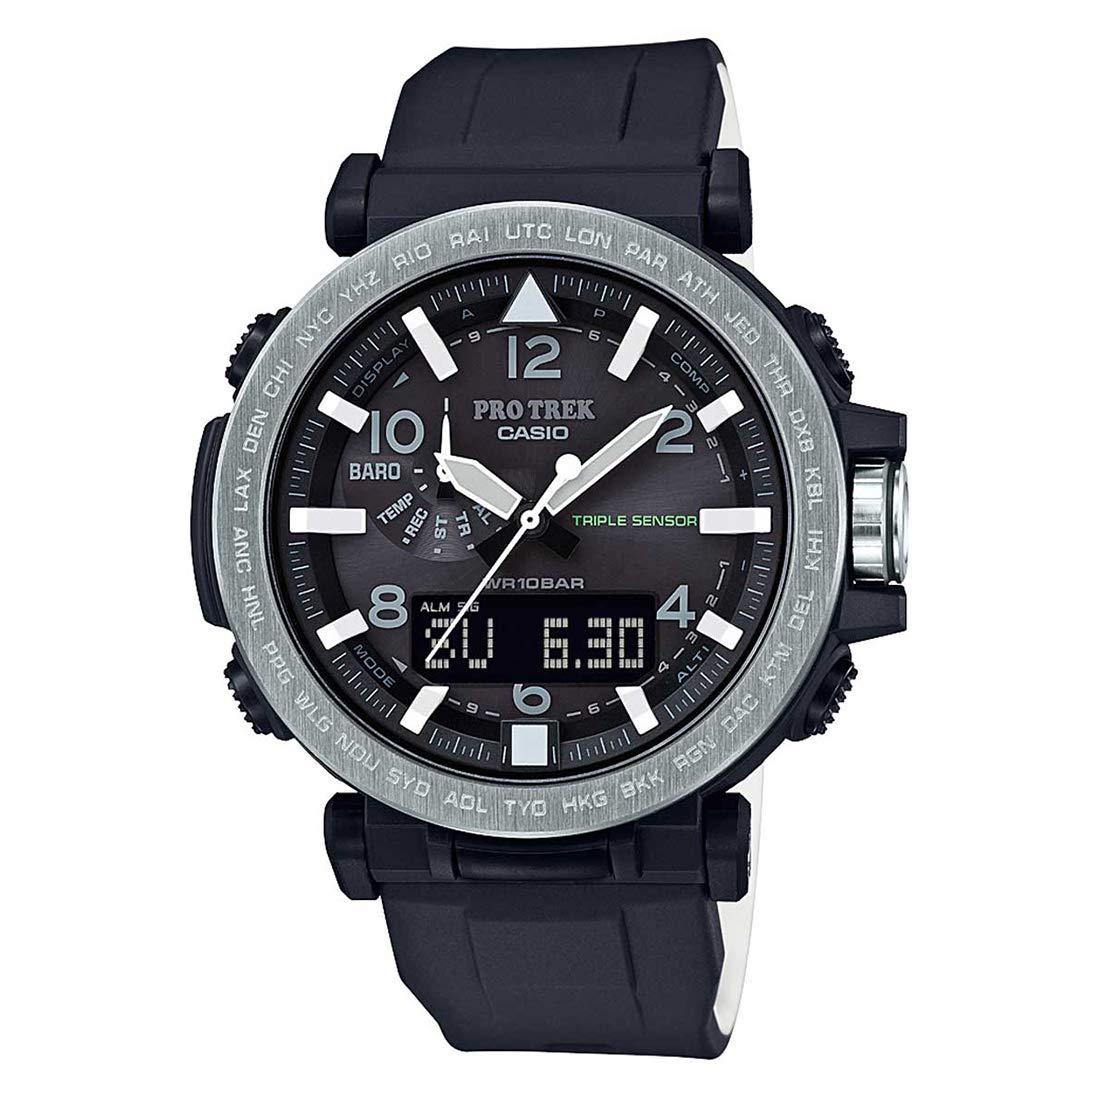 Casio Protrek Analog-Digital Black Dial Men's Watch - PRG-650-1DR (SL99)